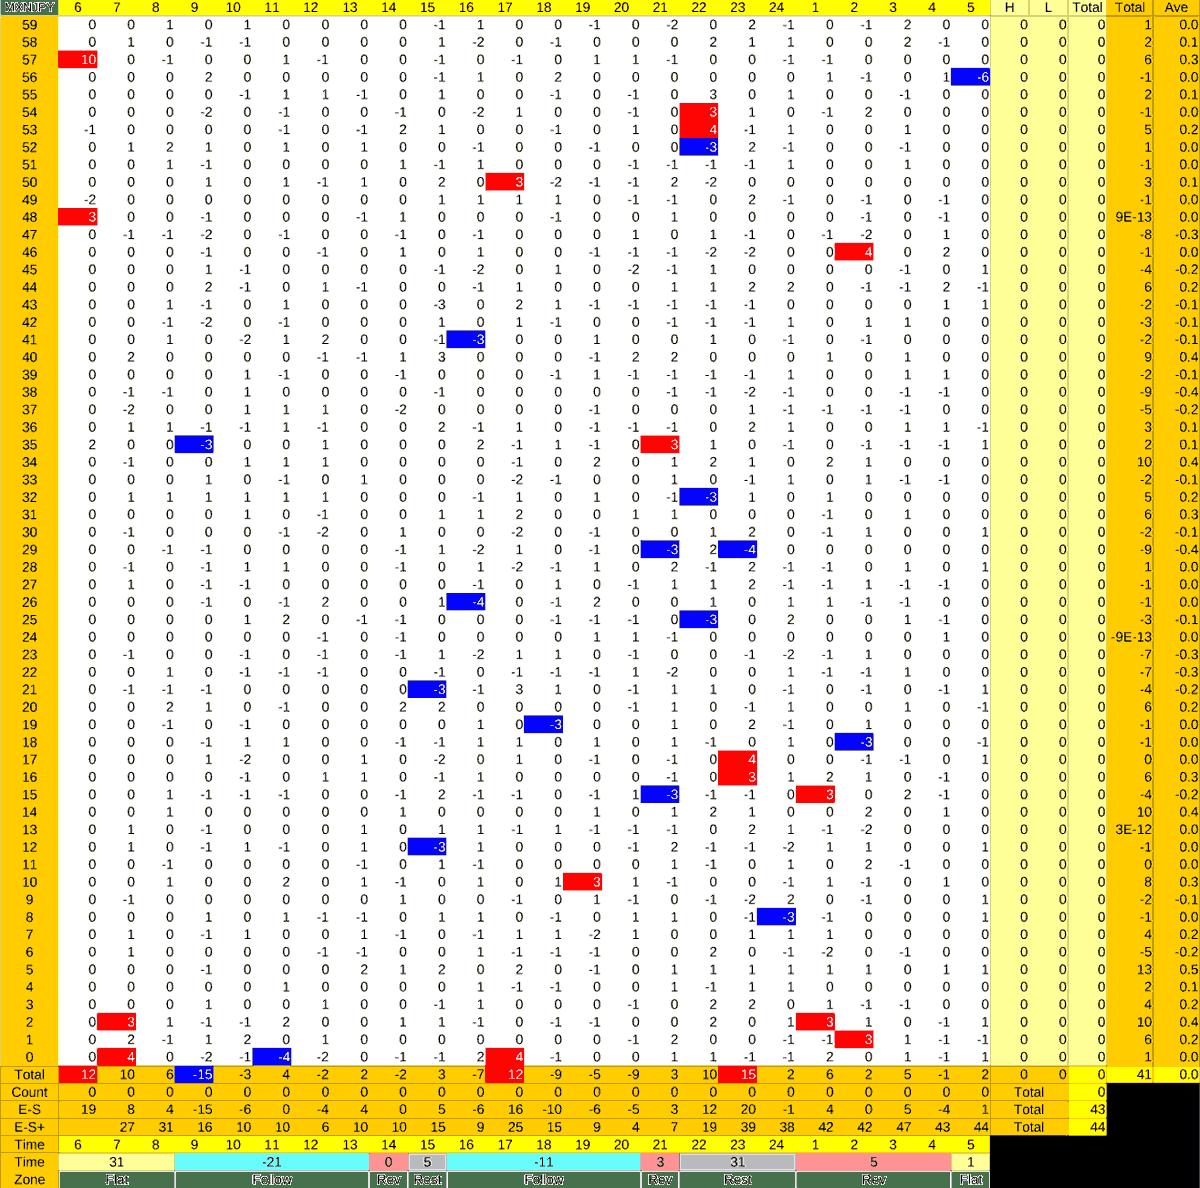 20210517_HS(3)MXNJPY